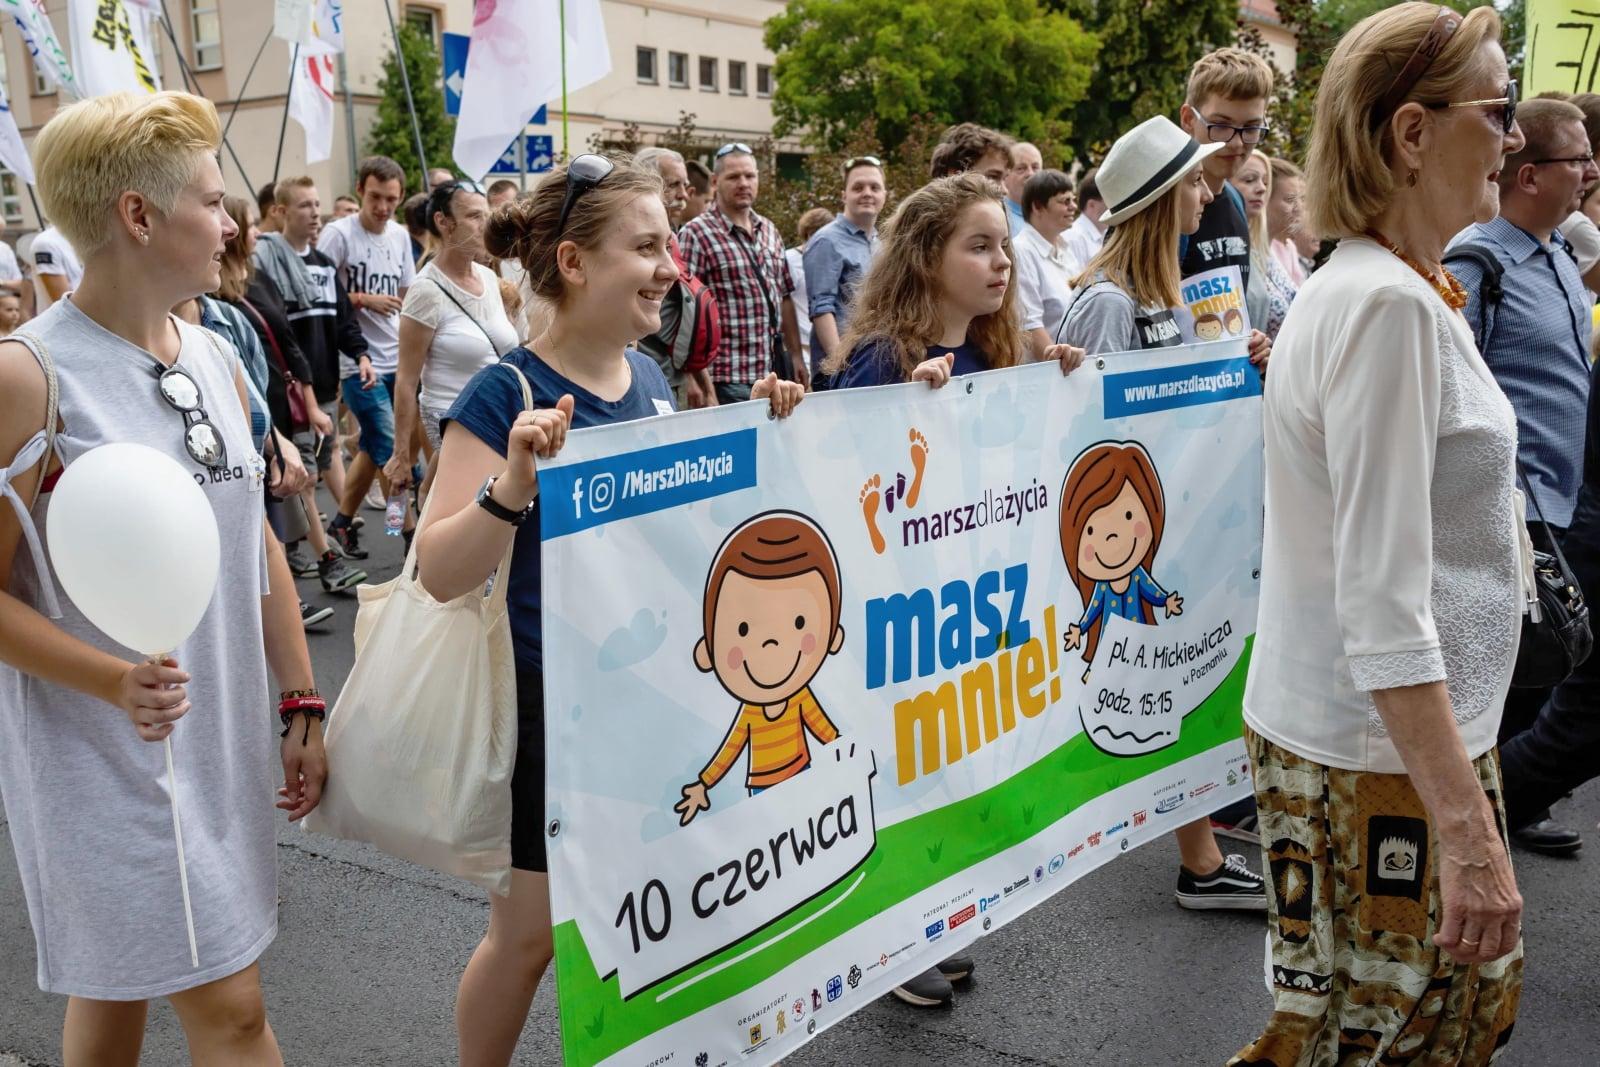 fot. PAP/Marek Zakrzewski